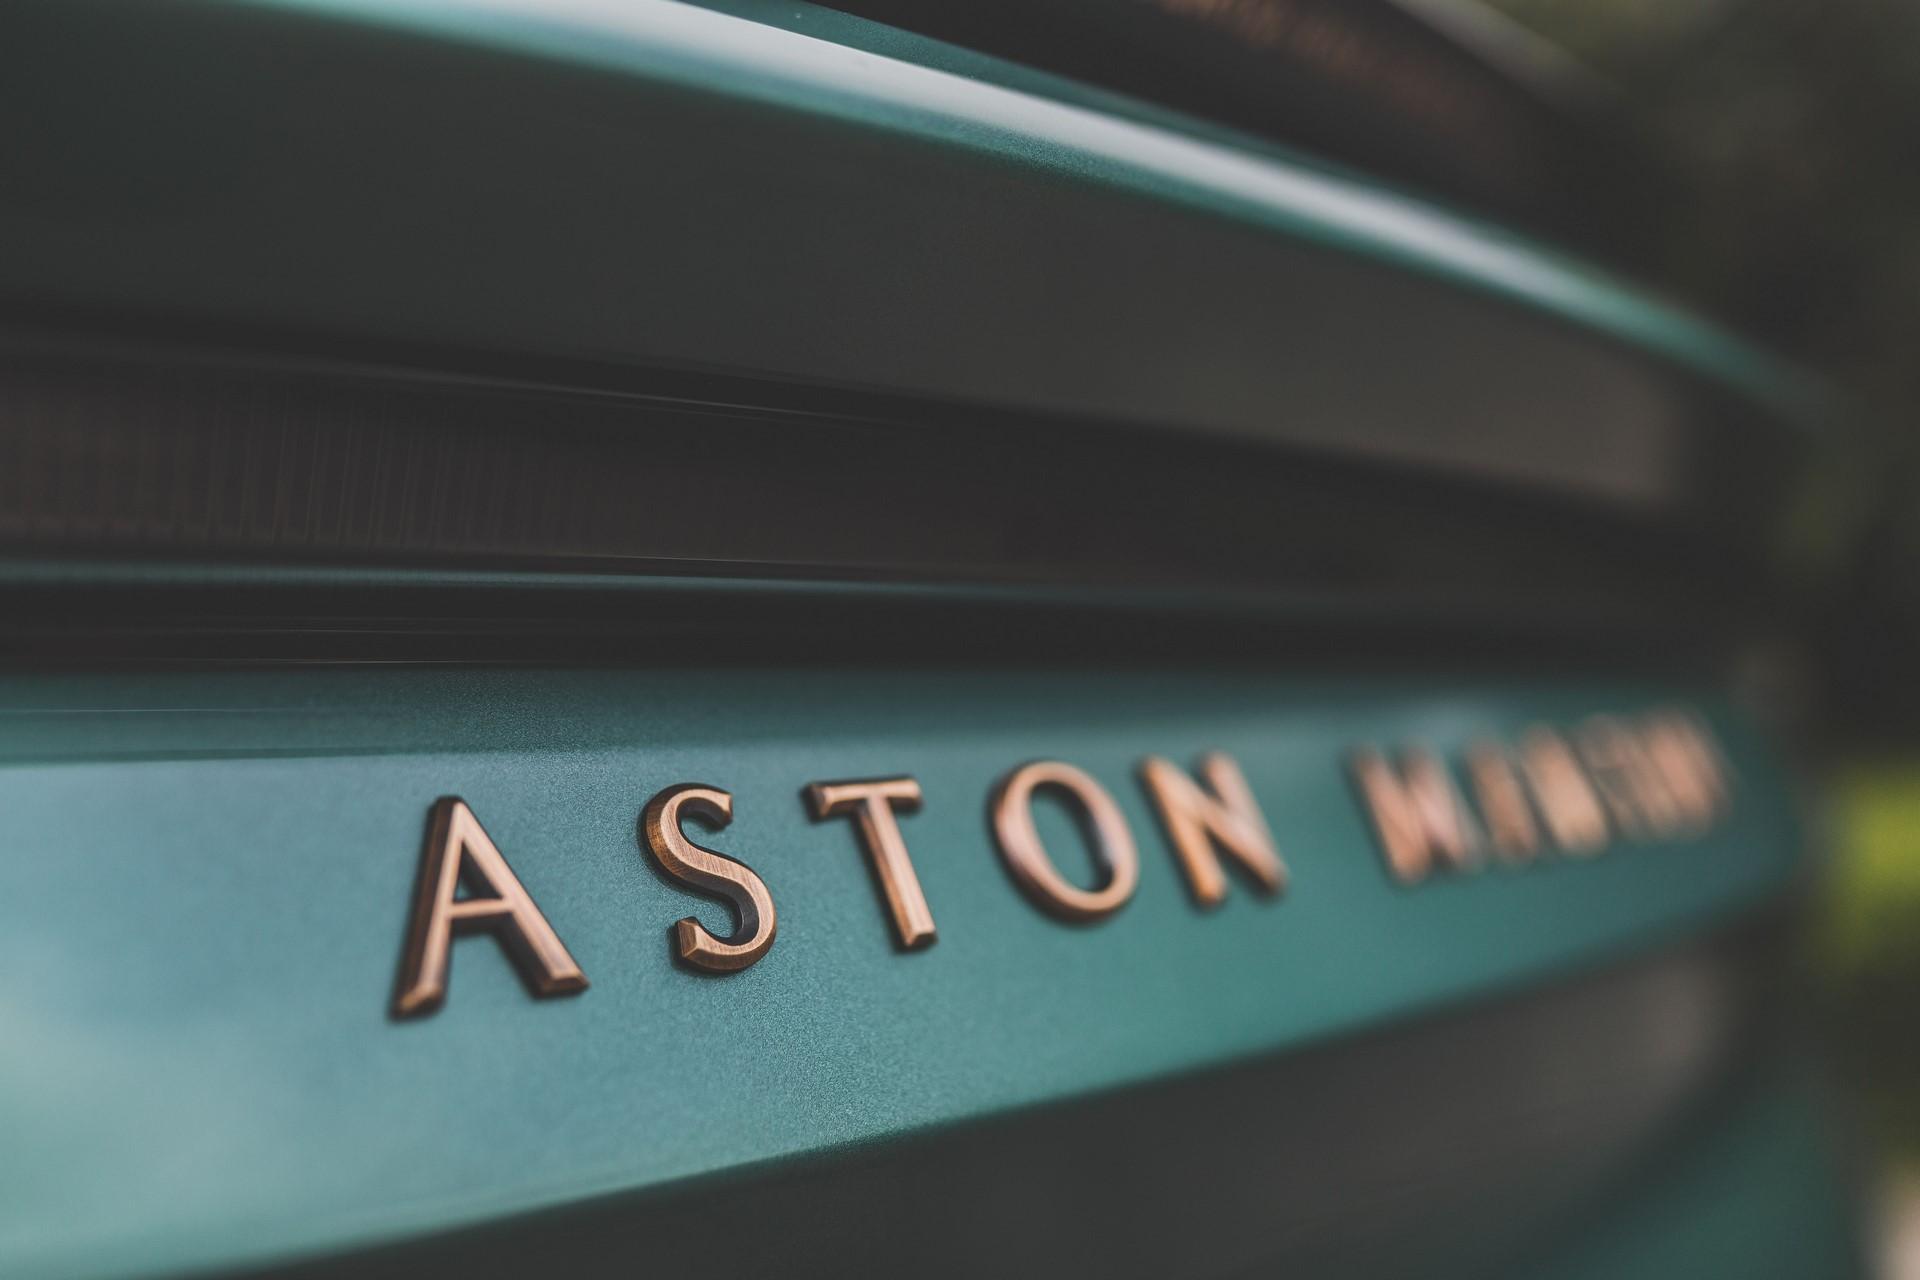 Aston-Martin-DBS-59-Edition-13